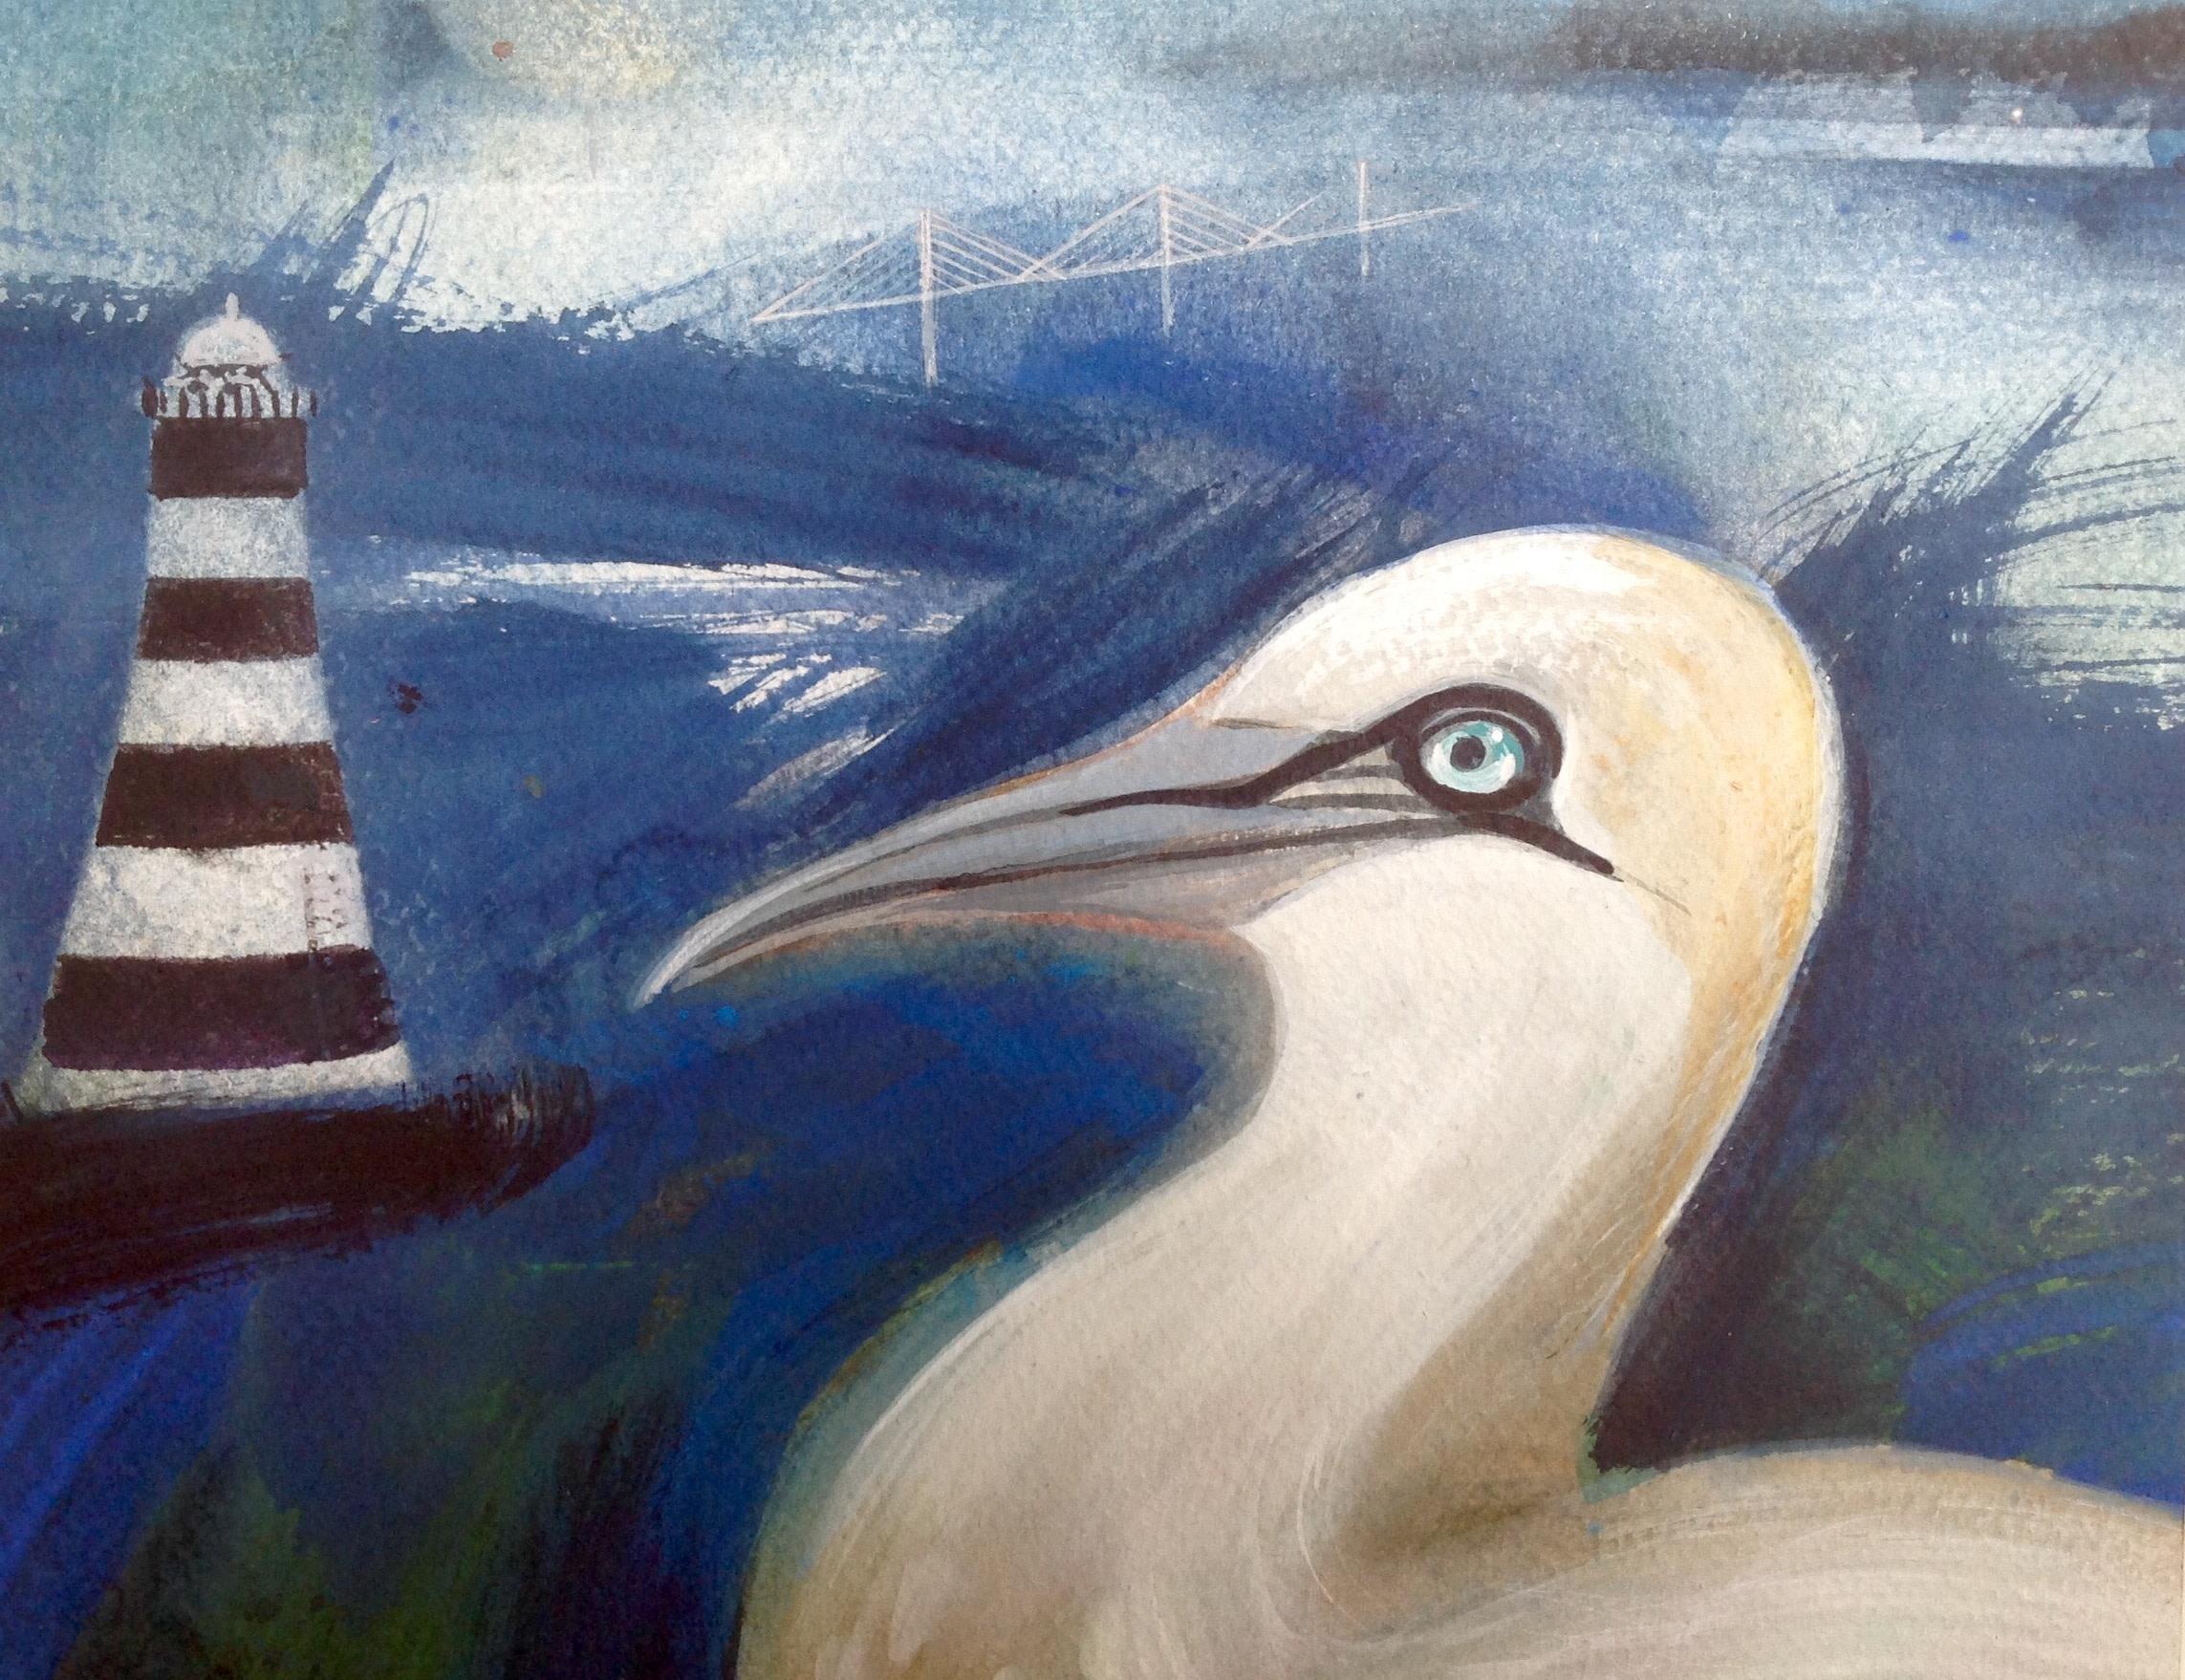 "<span class=""link fancybox-details-link""><a href=""/artists/49-helga-chart/works/10334-helga-chart-bird-s-eye-view/"">View Detail Page</a></span><div class=""artist""><span class=""artist""><strong>Helga Chart</strong></span></div><div class=""title""><em>Bird's Eye View</em></div><div class=""medium"">watercolour</div><div class=""dimensions"">33 x 31cm</div><div class=""price"">£380.00</div>"